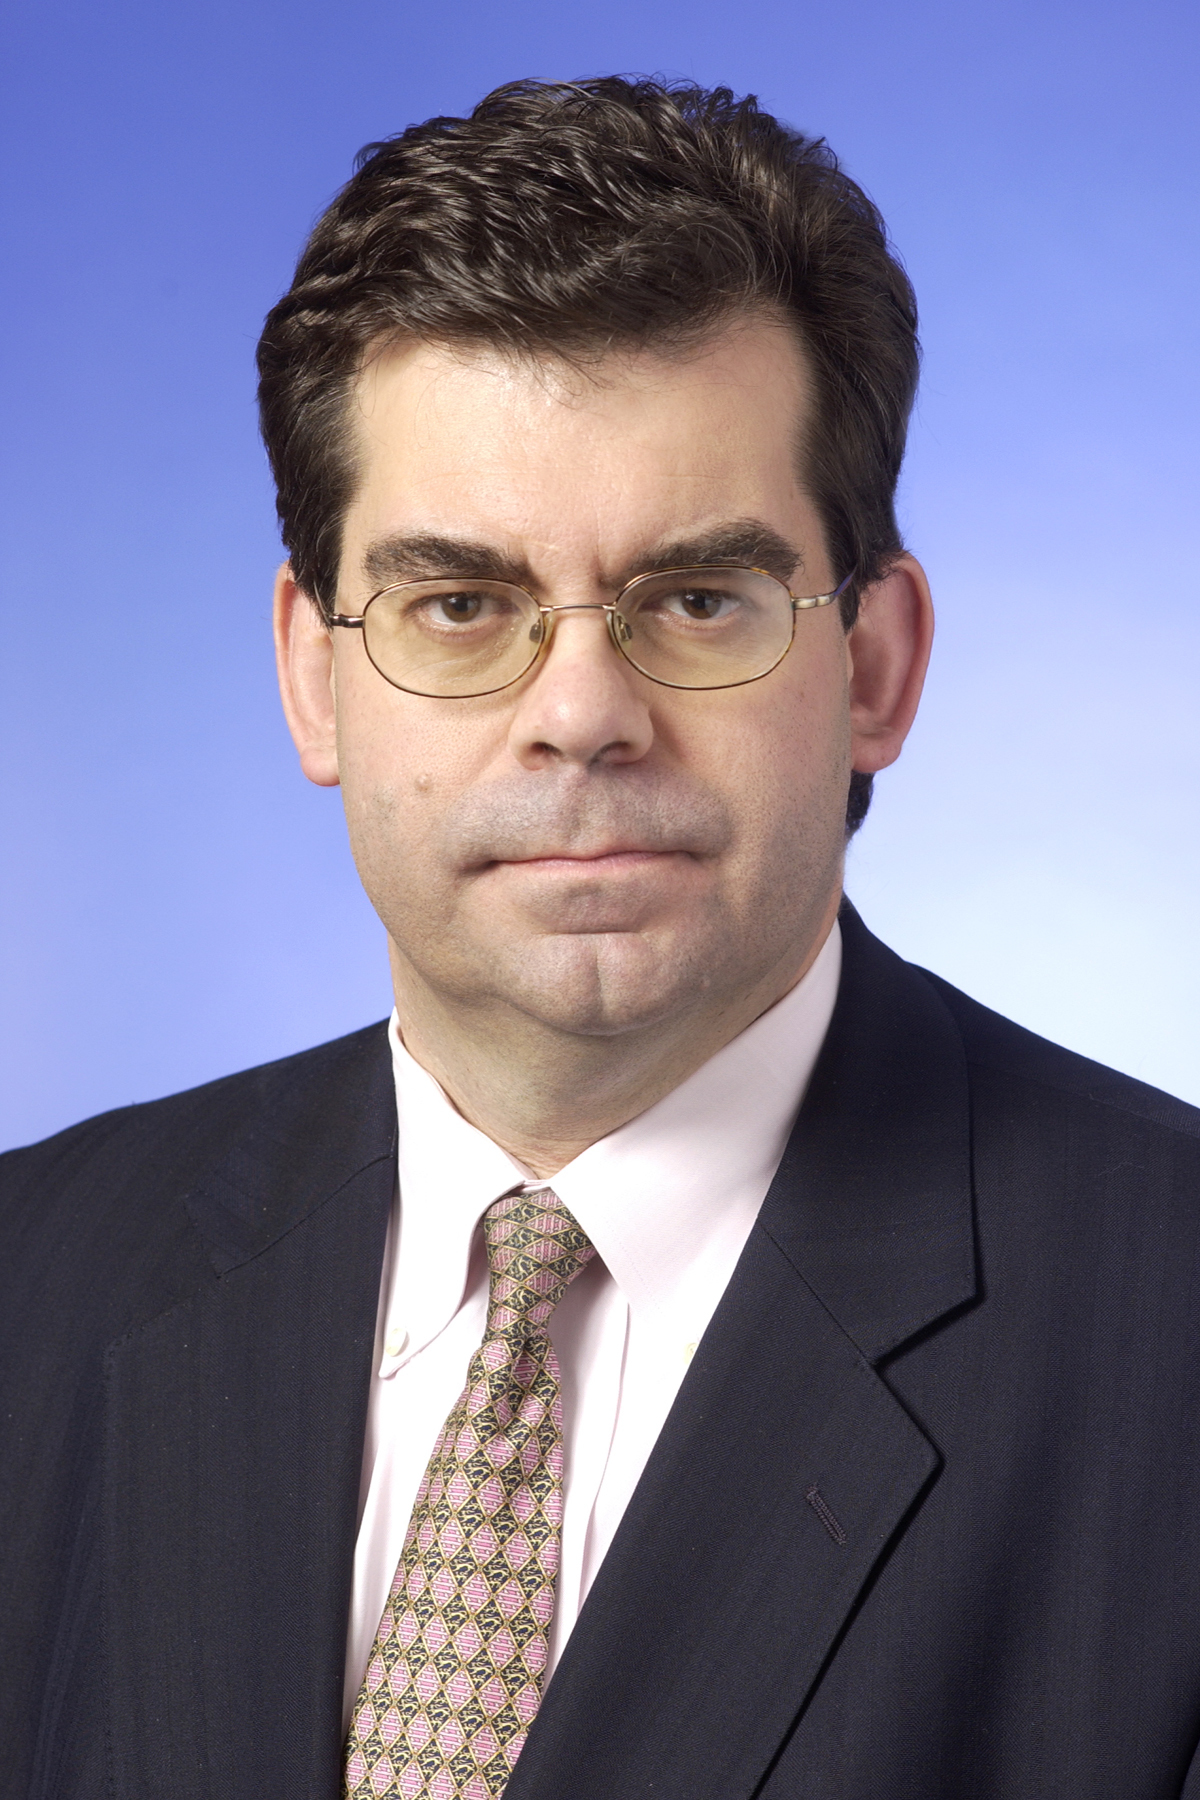 Trevor D'Olier-Lees, senior director, global infrastructure ratings, S&P Global Ratings